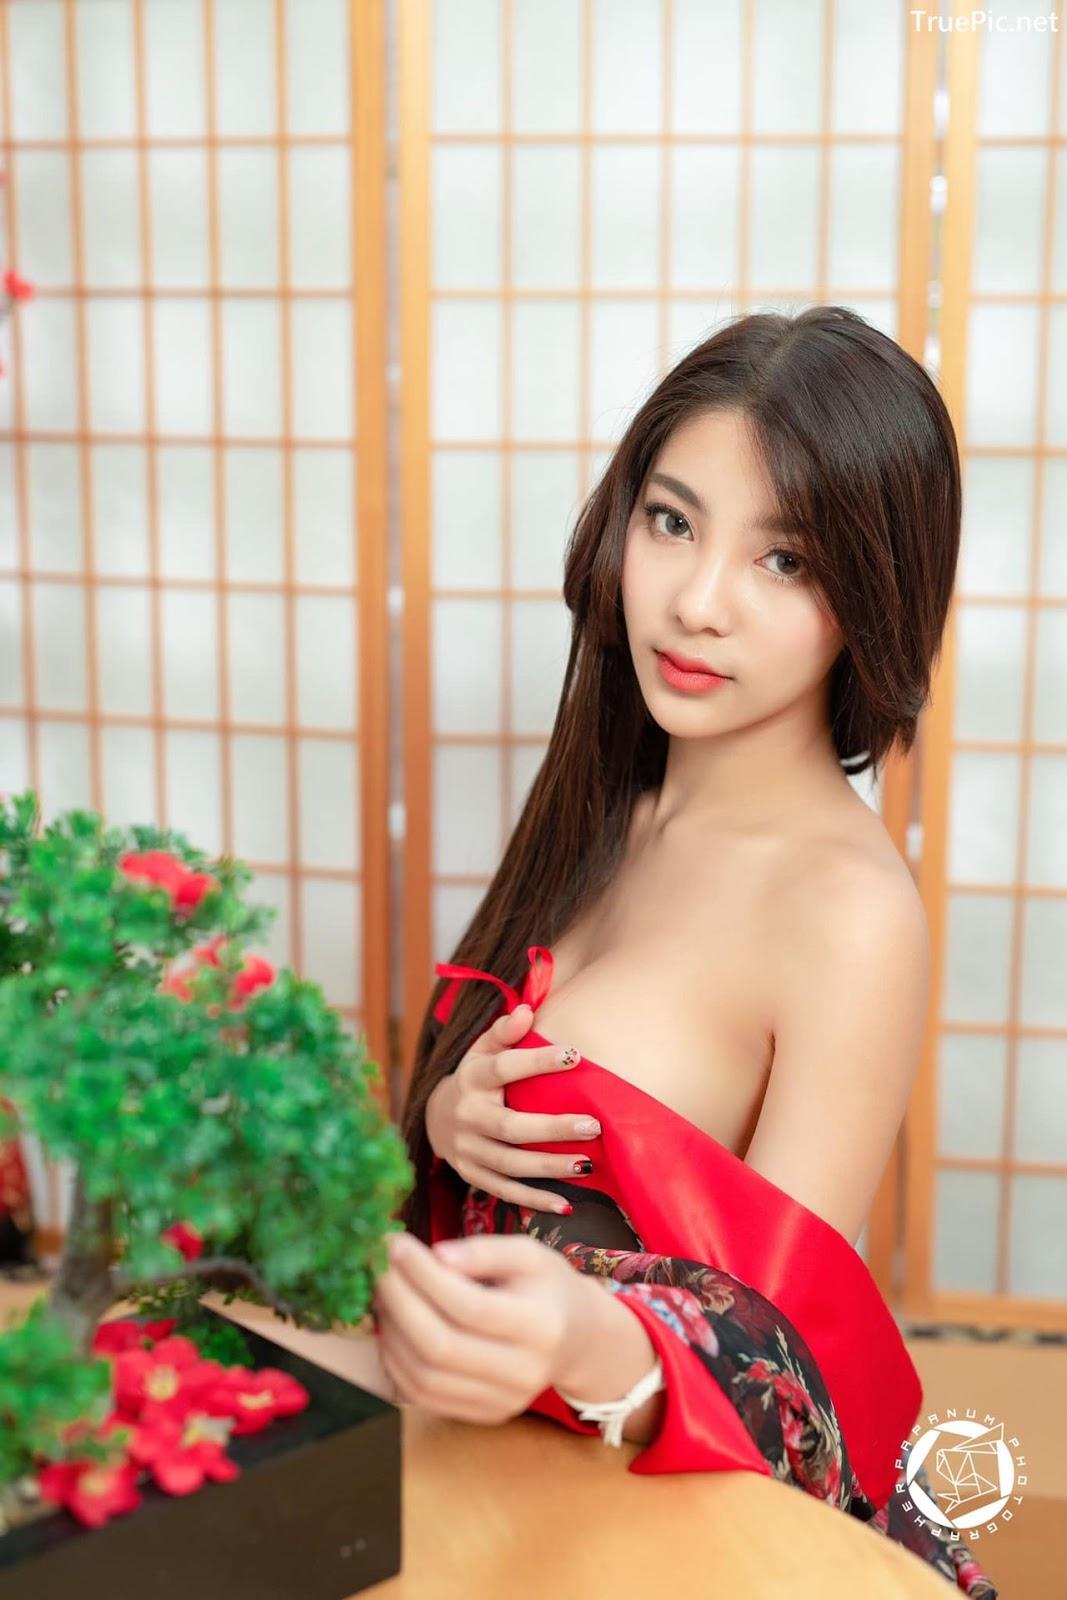 Image-Thailand-Model-Printlaaplus-Zhaengchohm-Cosplay-Japanese-Beautiful-Girl-TruePic.net- Picture-10